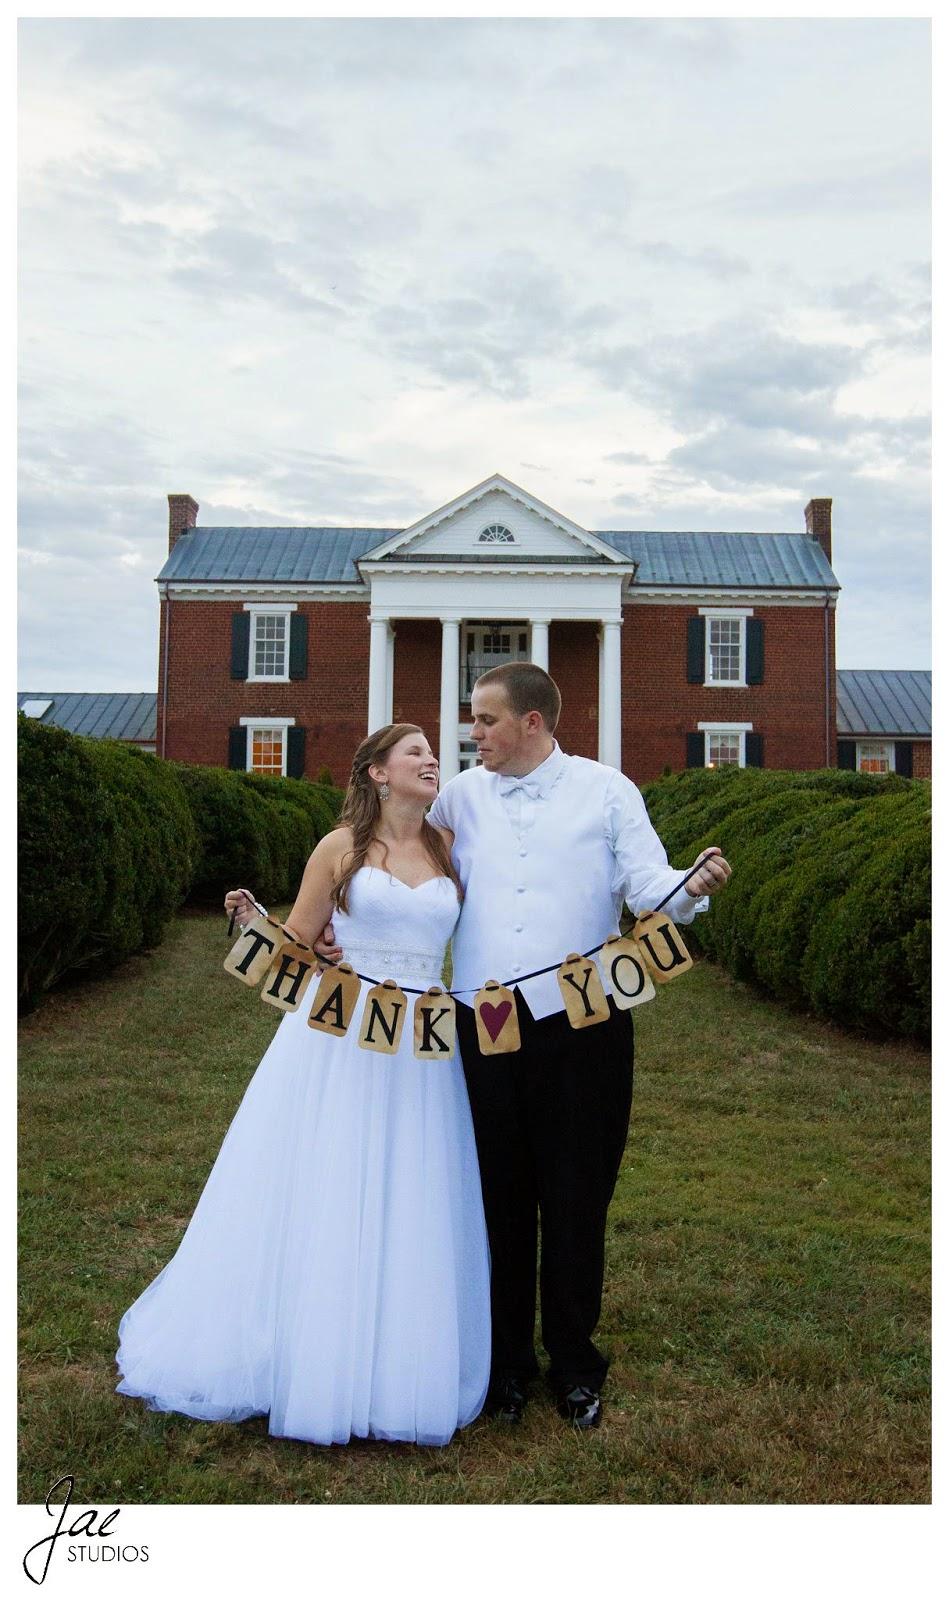 Jonathan and Julie, Bird cage, West Manor Estate, Wedding, Lynchburg, Virginia, Jae Studios, thank you sign, bride, groom, wedding dress, tuxedo, grass, end